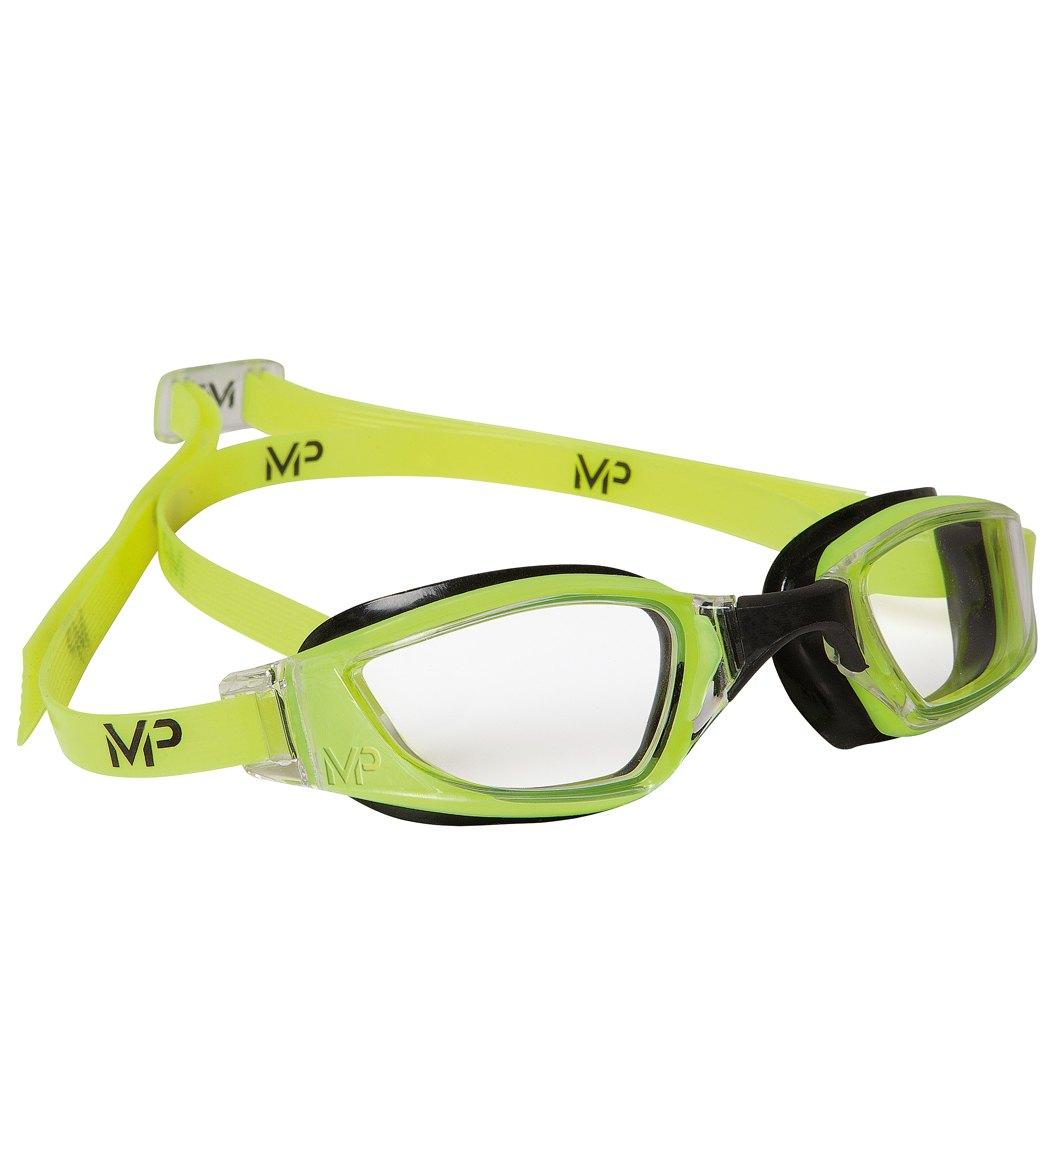 9e64fb8e0a MP Michael Phelps Mirrored Xceed Goggle  39.99. 4 Review Stars · remove  photo